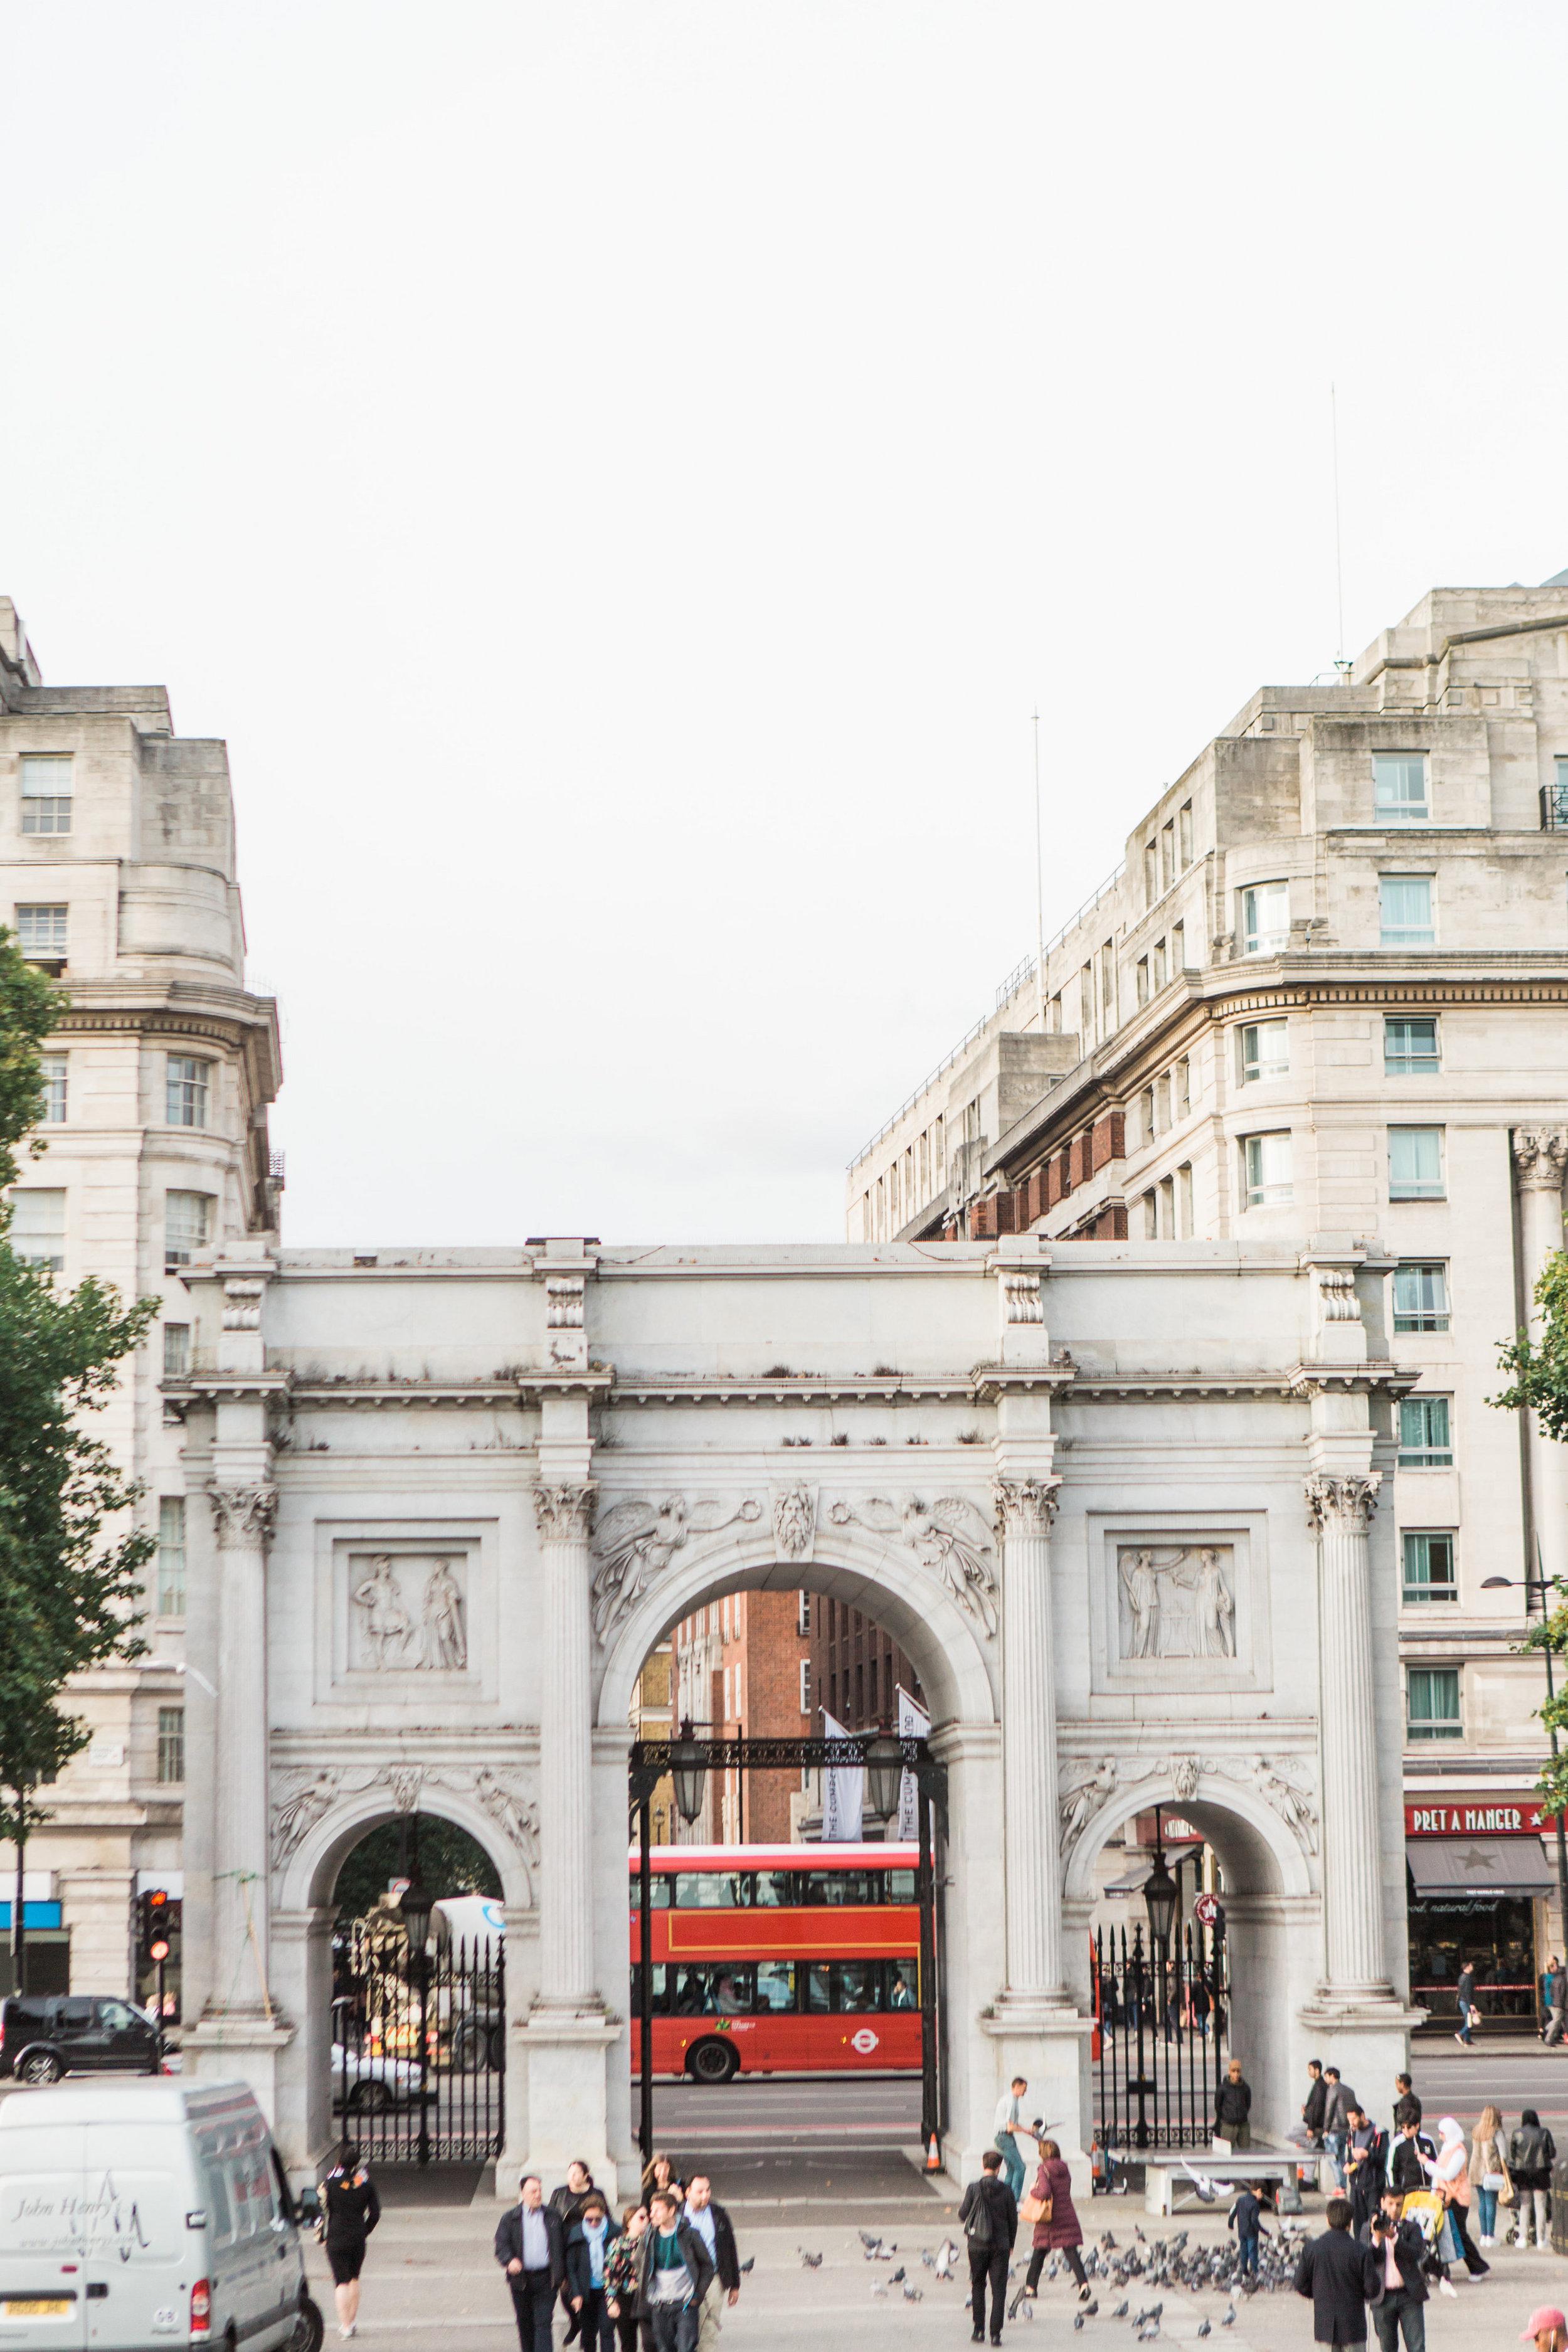 England 2017-Day 4 London Bus tour-0044.jpg